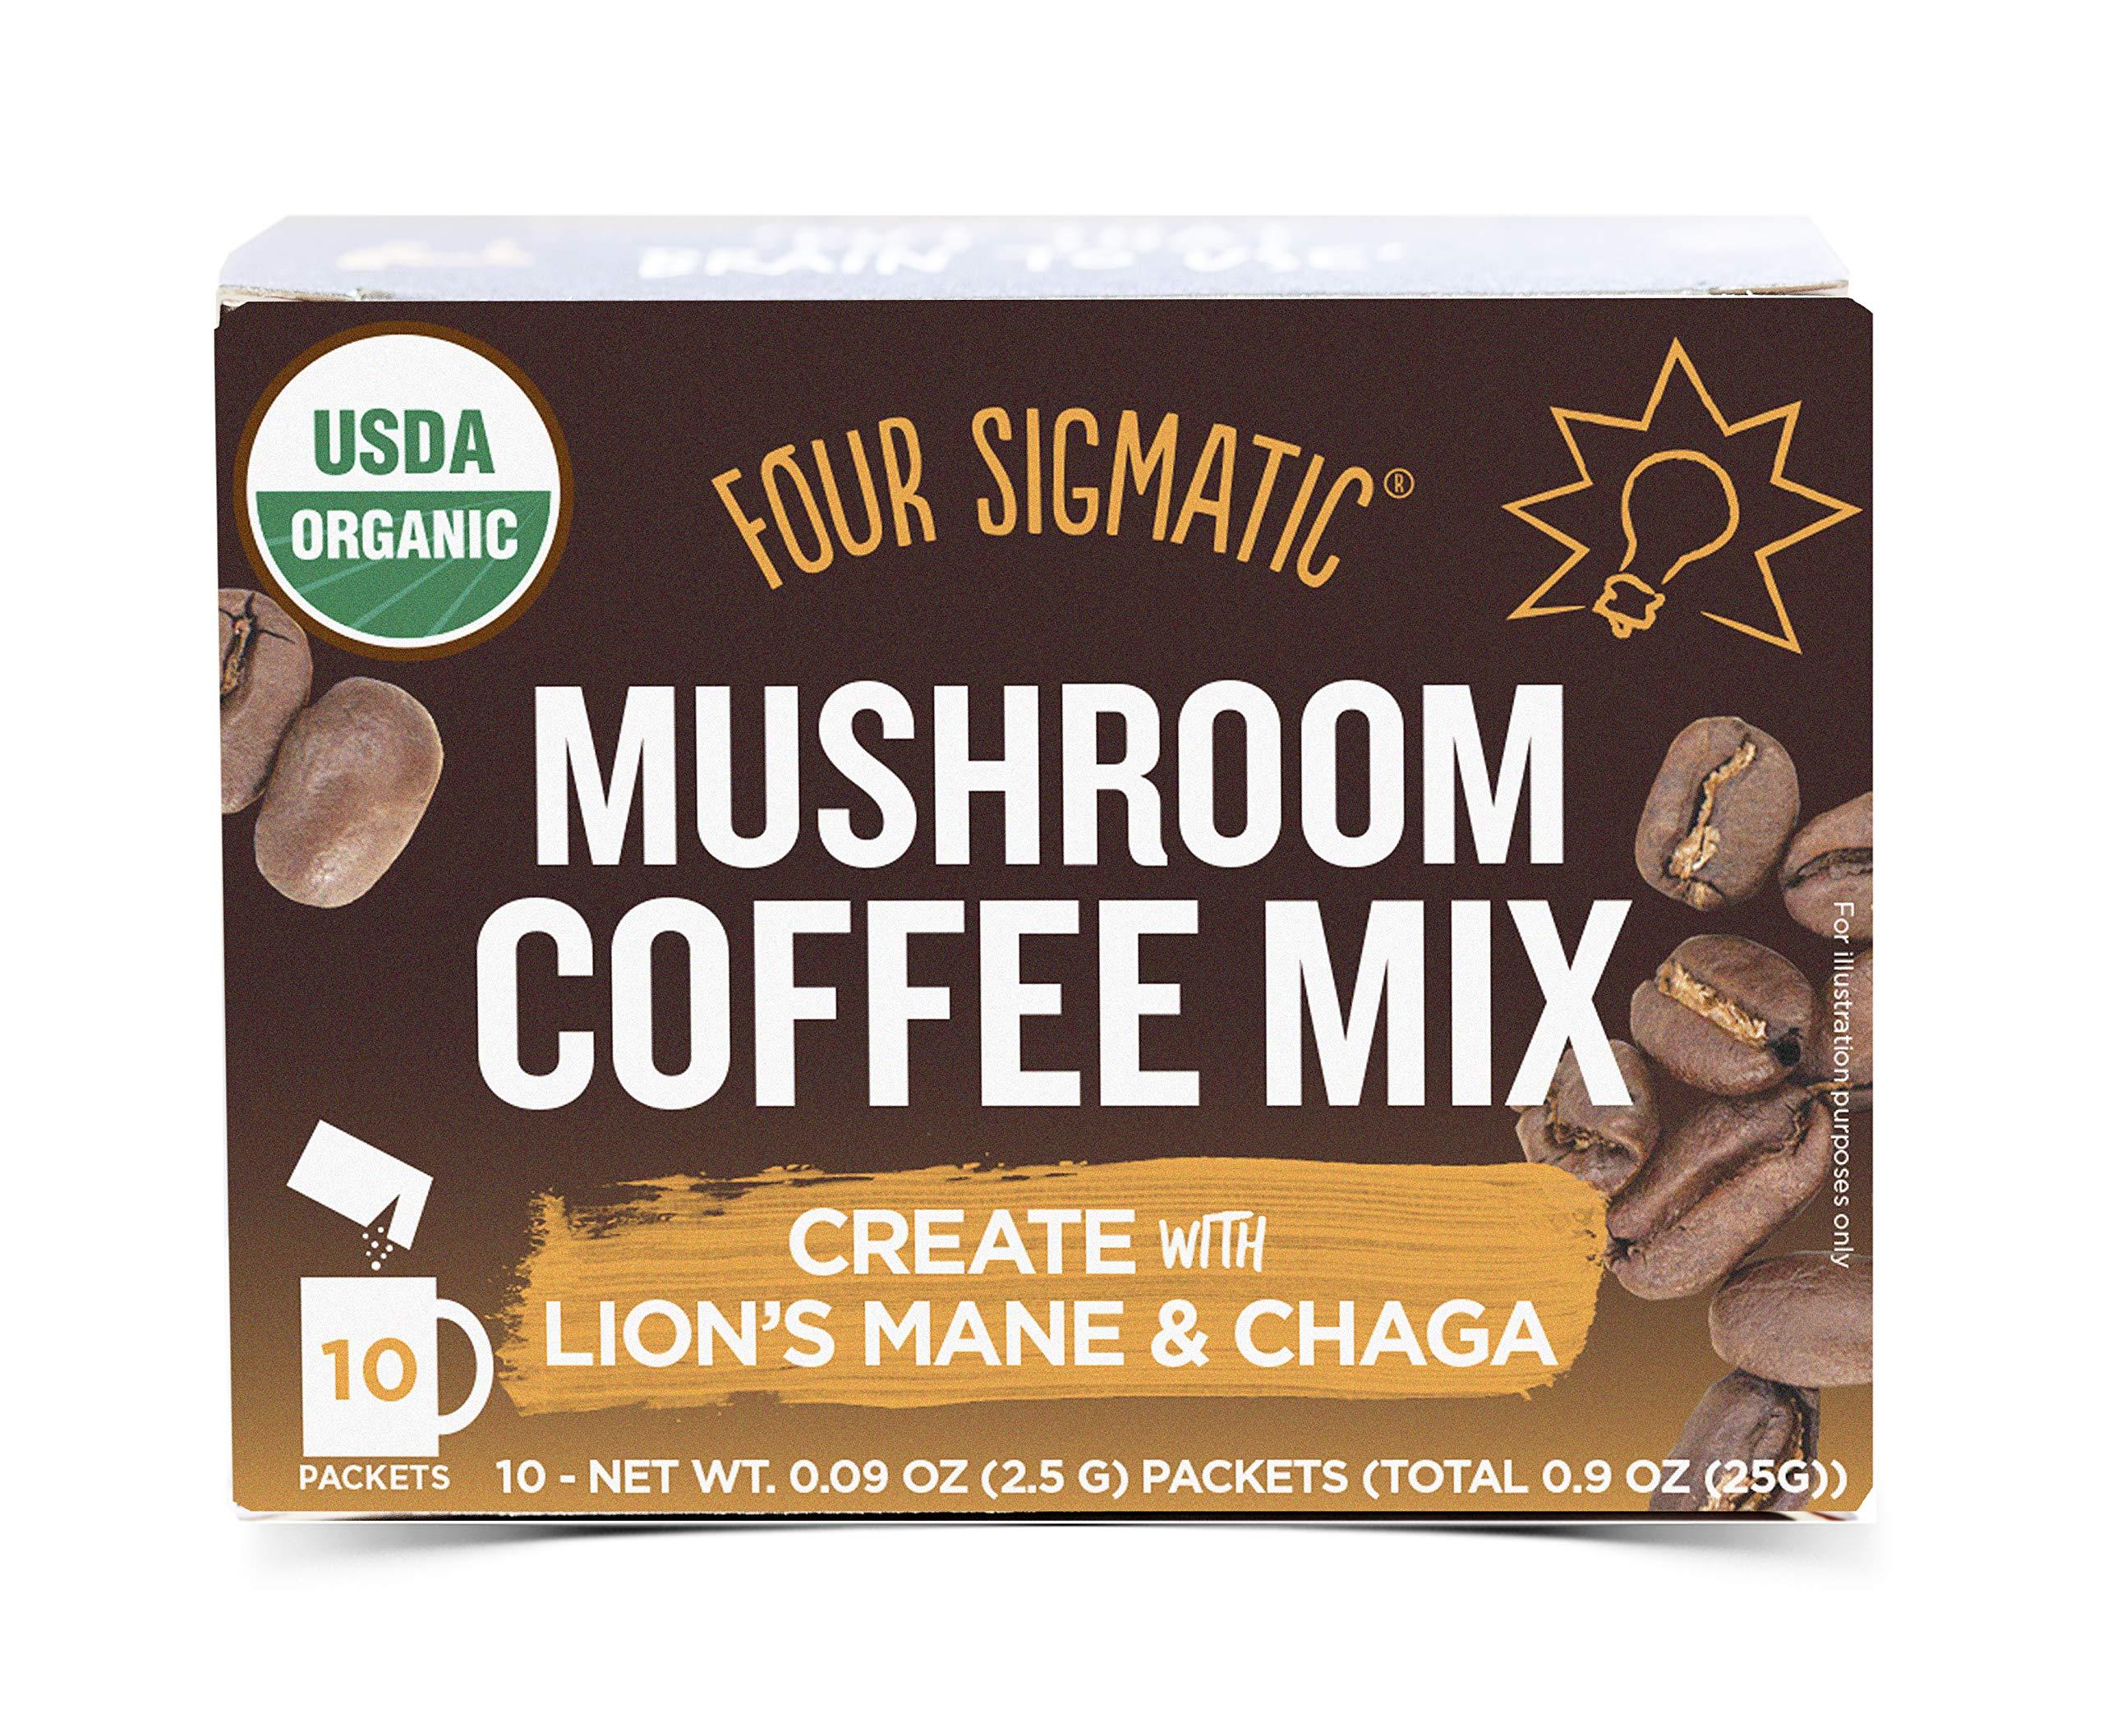 Four Sigmatic Mushroom Coffee, USDA Organic Coffee with Lion's Mane and Chaga mushrooms, Productivity, Vegan, Paleo, 10 Count, Packaging May Vary